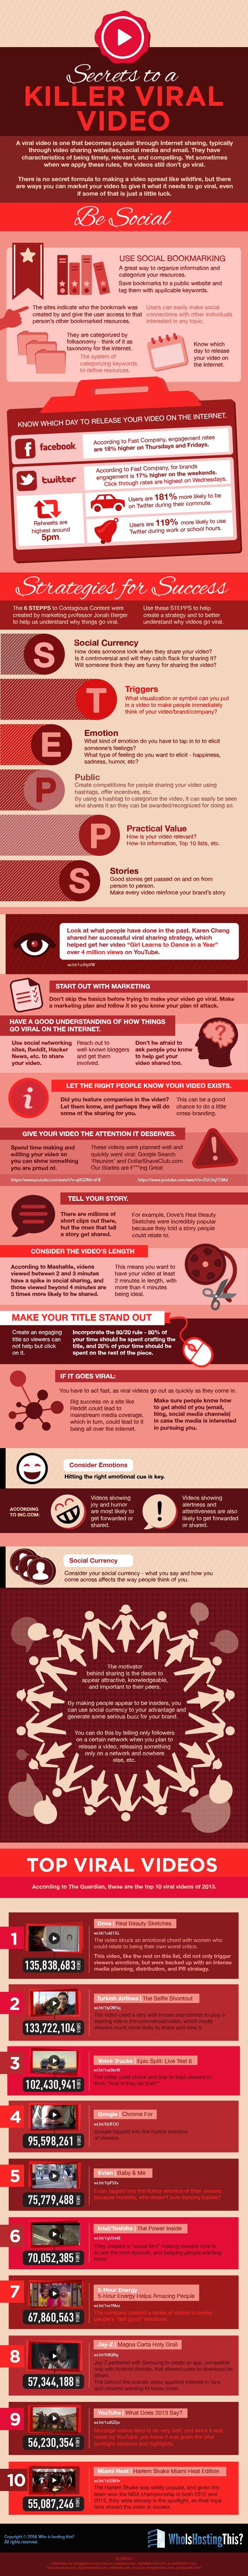 Secrets to a Killer Viral #Video - Do you fancy an infographic? There are a lot of them online, but if you want your own please visit http://www.linfografico.com/prezzi/ Online girano molte infografiche, se ne vuoi realizzare una tutta tua visita http://www.linfografico.com/prezzi/